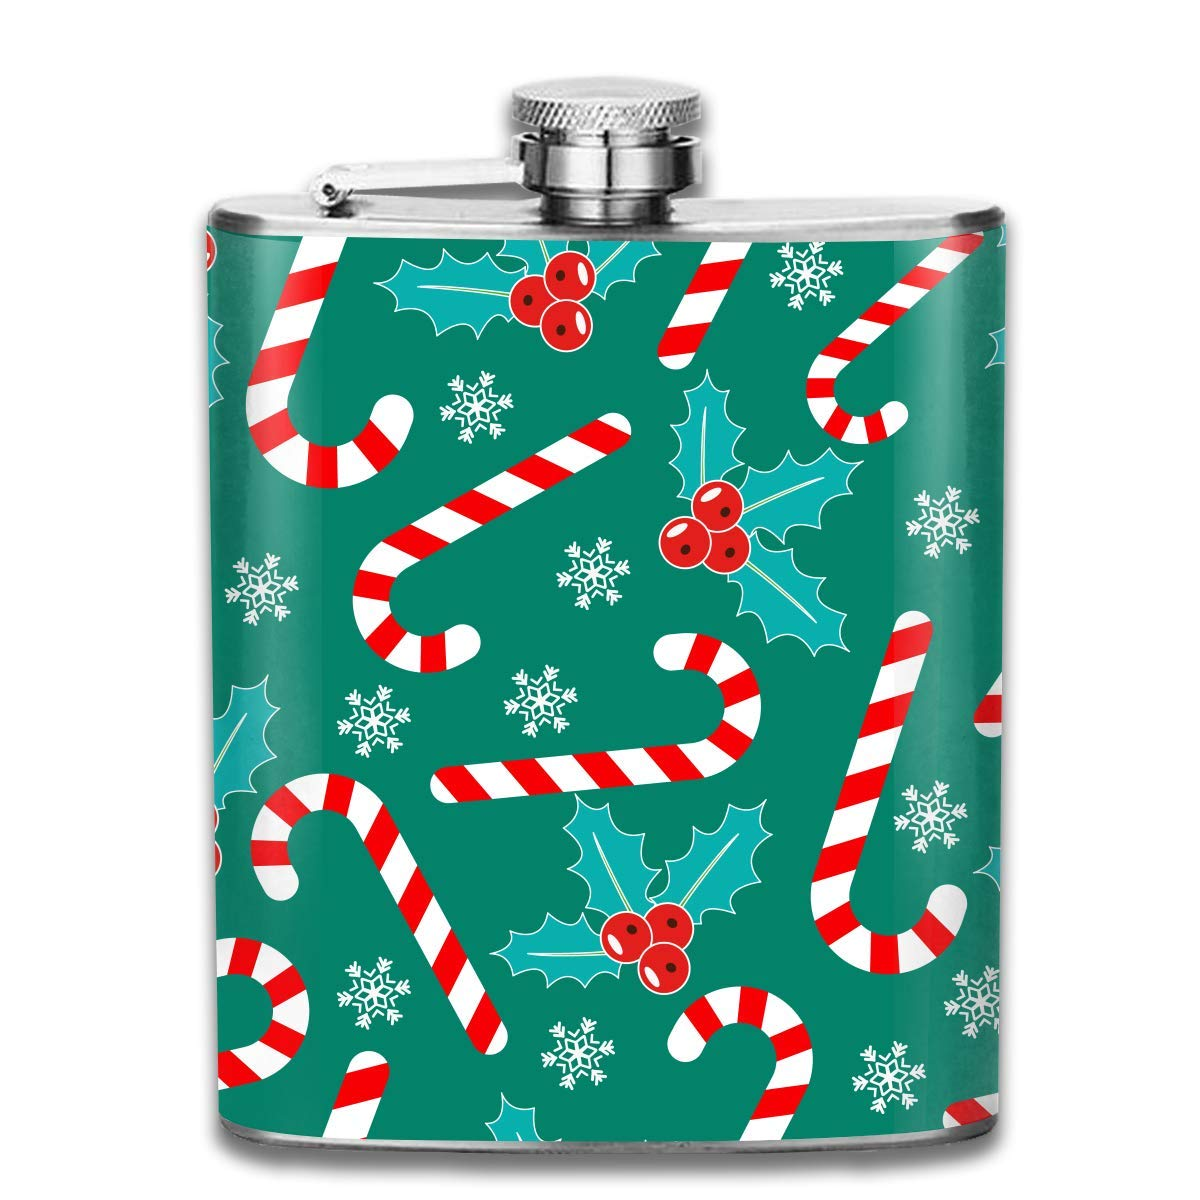 Ejdkdo Romantic Christmas Stainless Steel Flask Wearproof 7OZ Hip Flask Pocket Flagon Whiskey Wine Flagon Mug